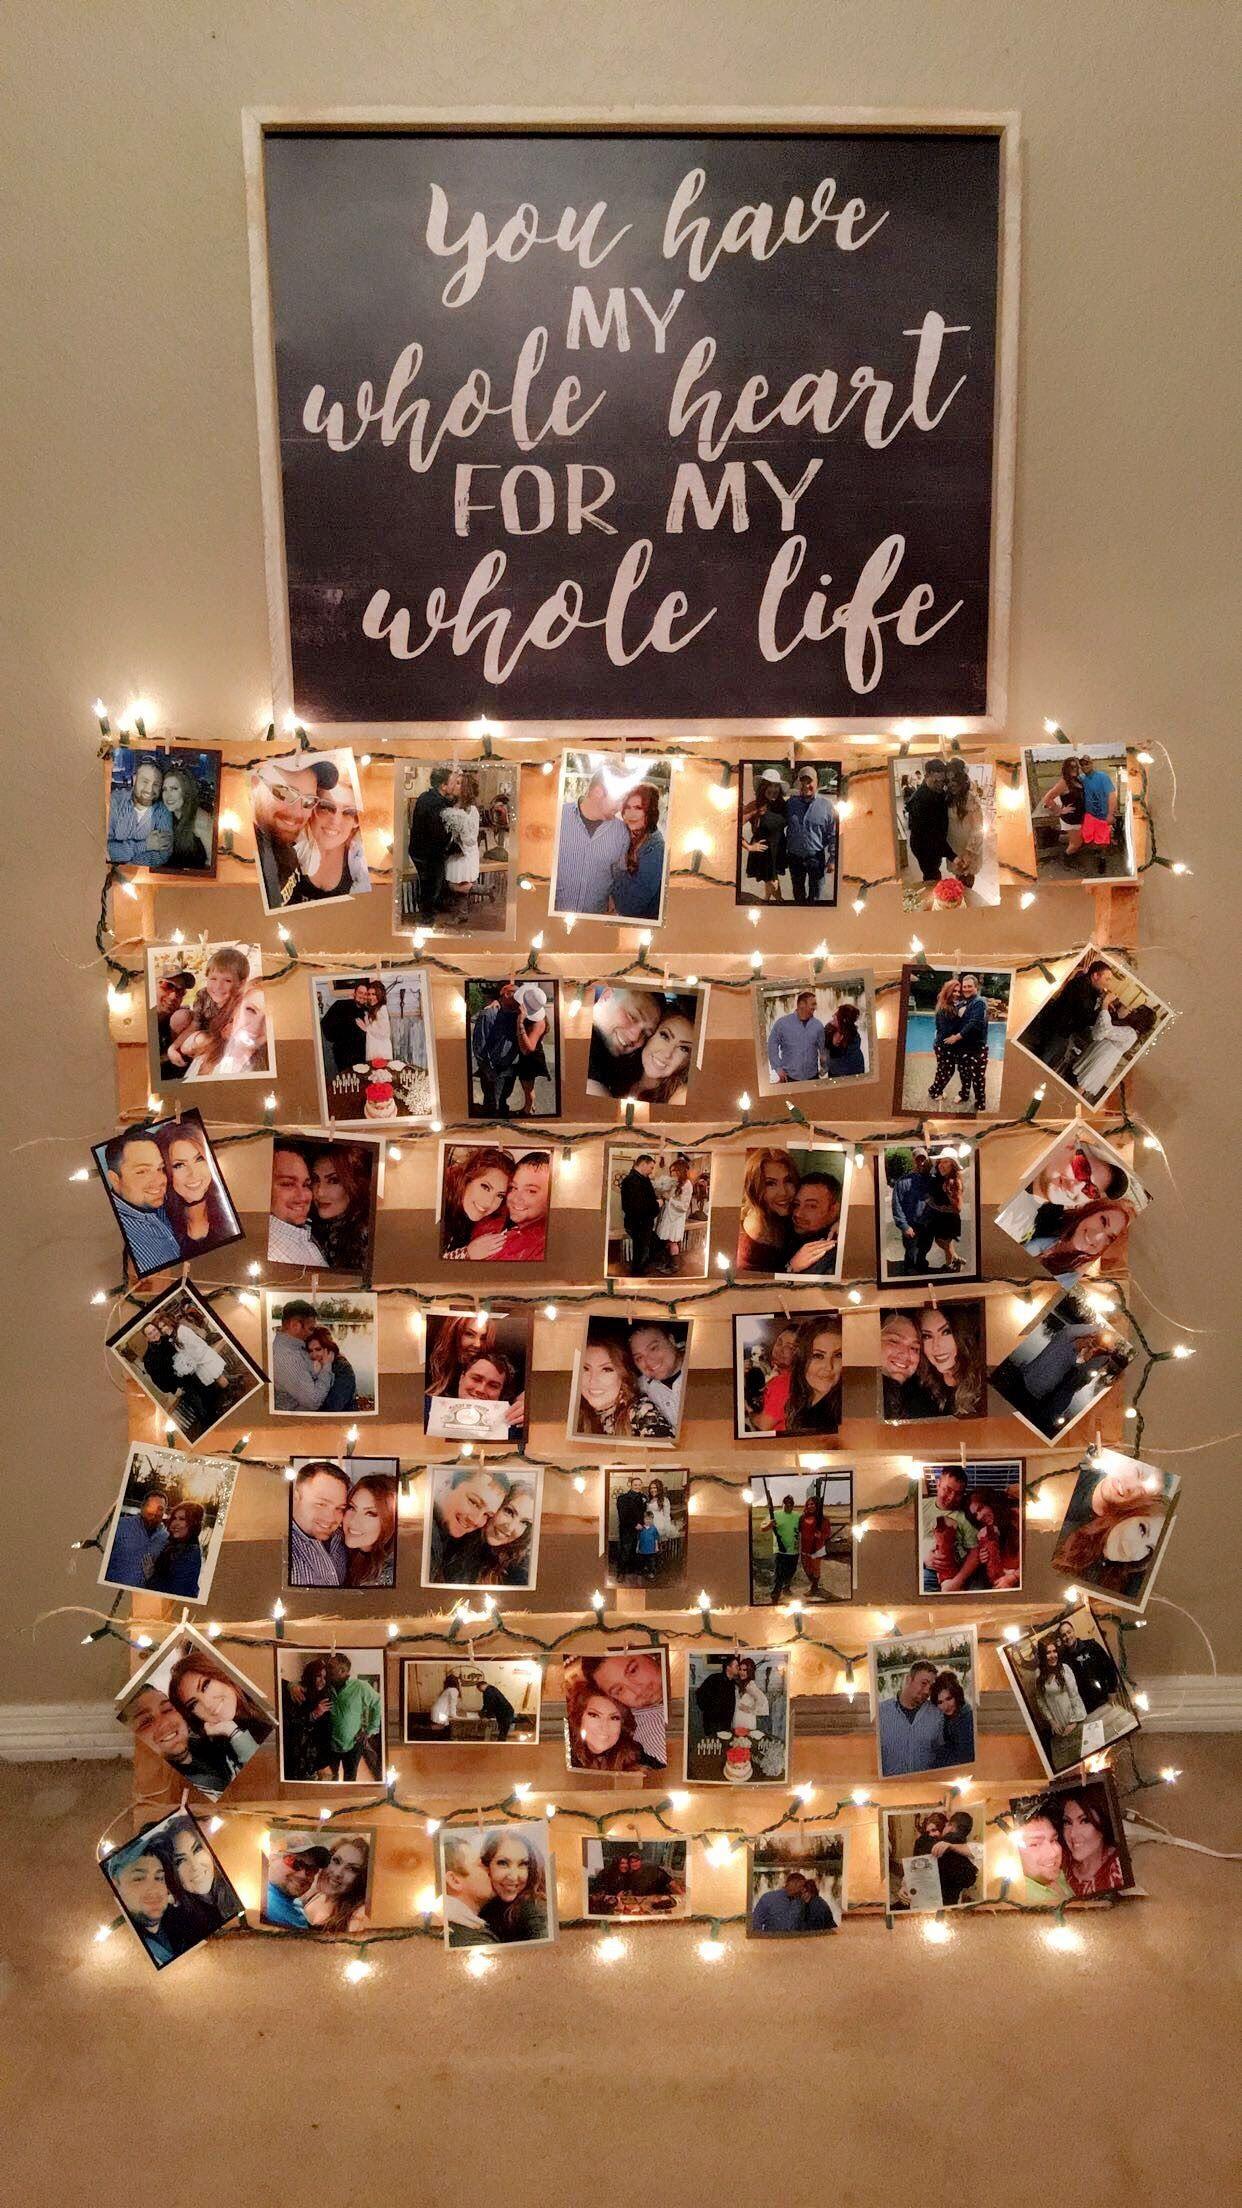 Franziska #engagementpartyideasdecorations